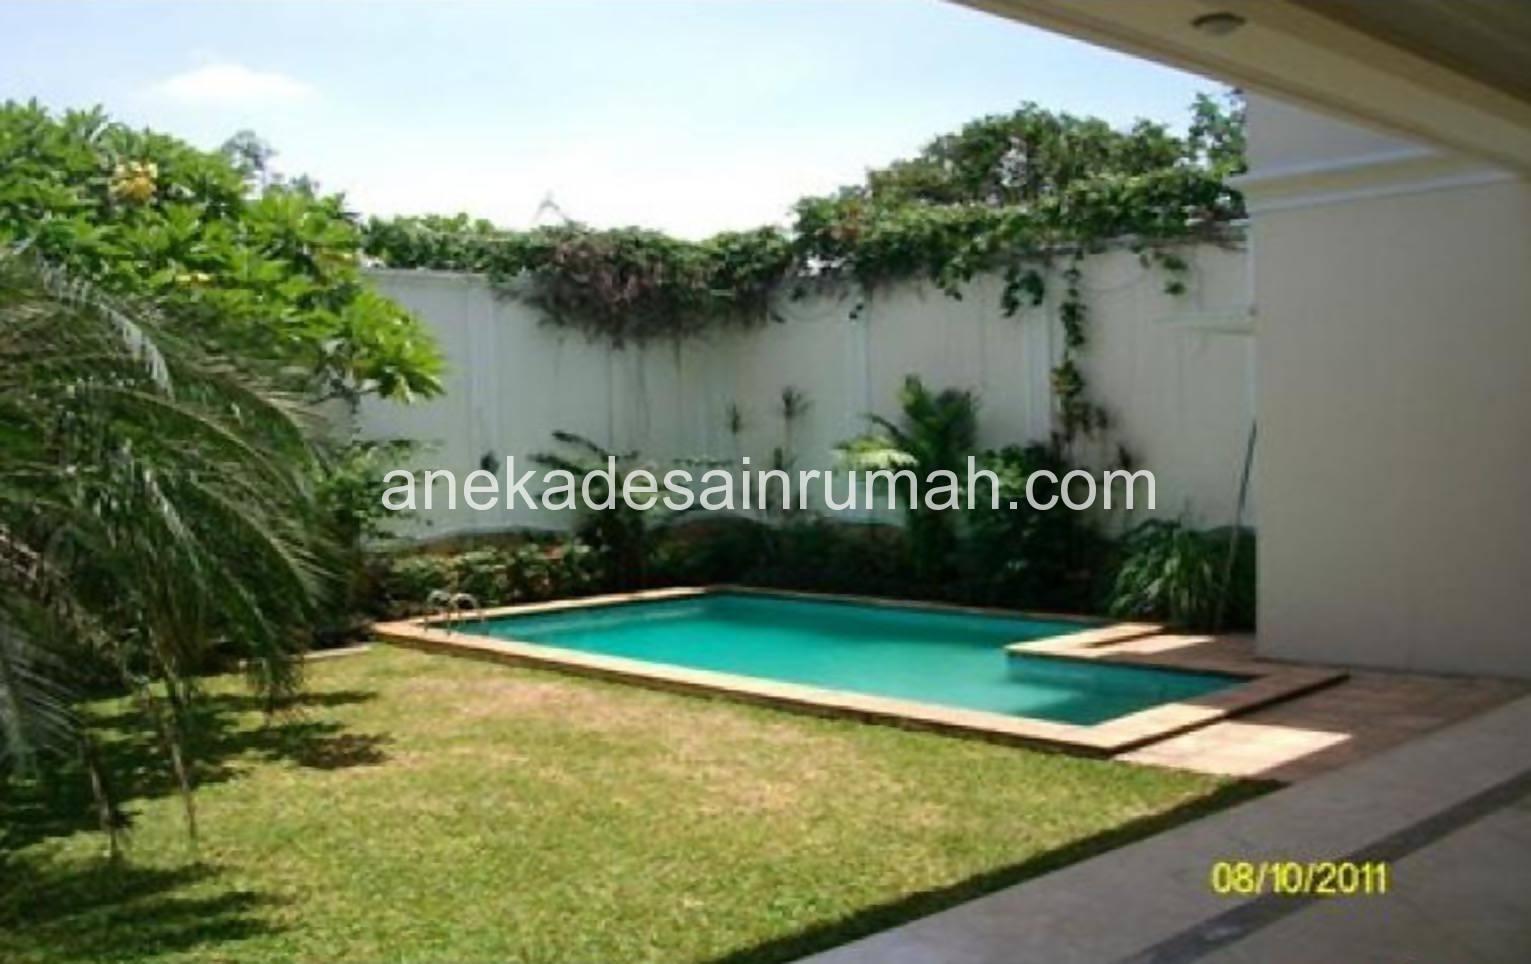 Foto kolam renang rumahan, desain minimalis keperluan